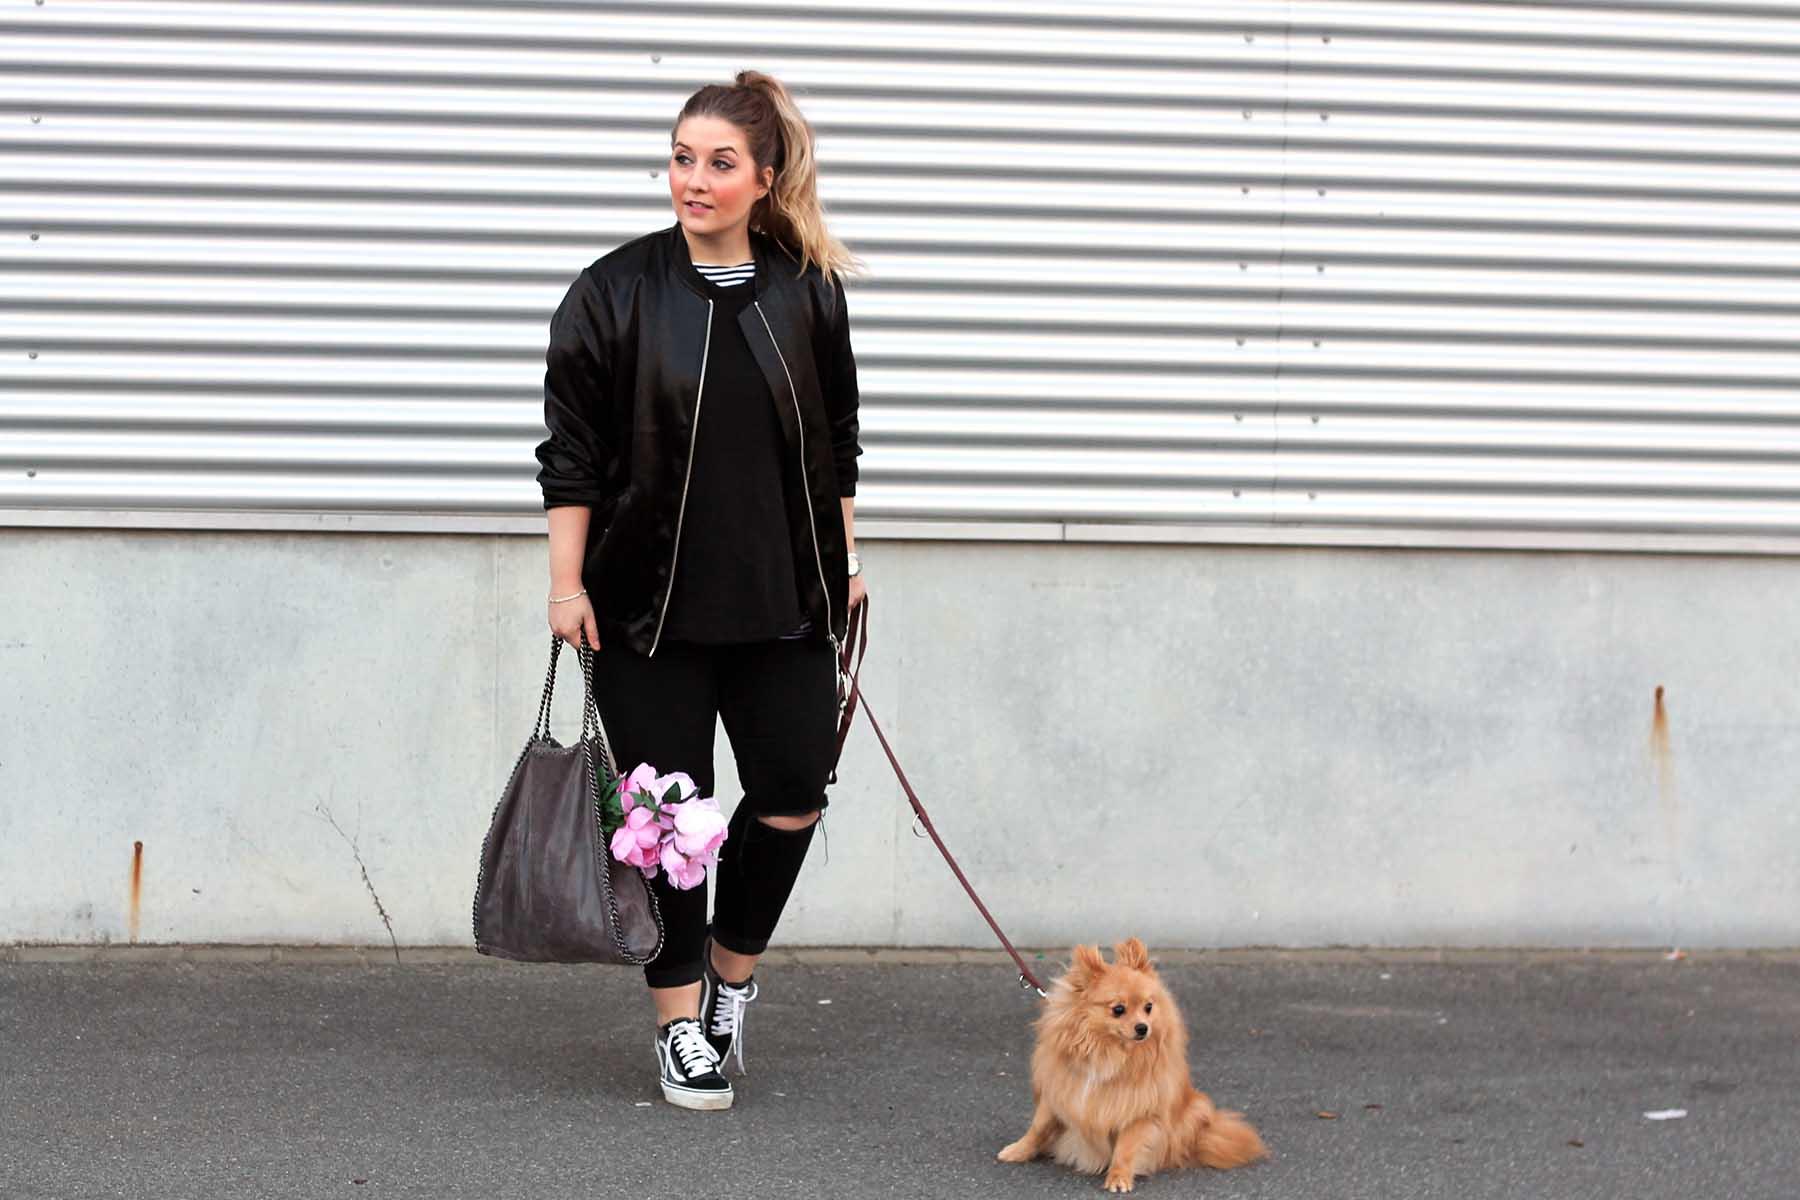 modeblog-fashionblog-outfit-look-bomberjacke-schwarz-vans-sneaker